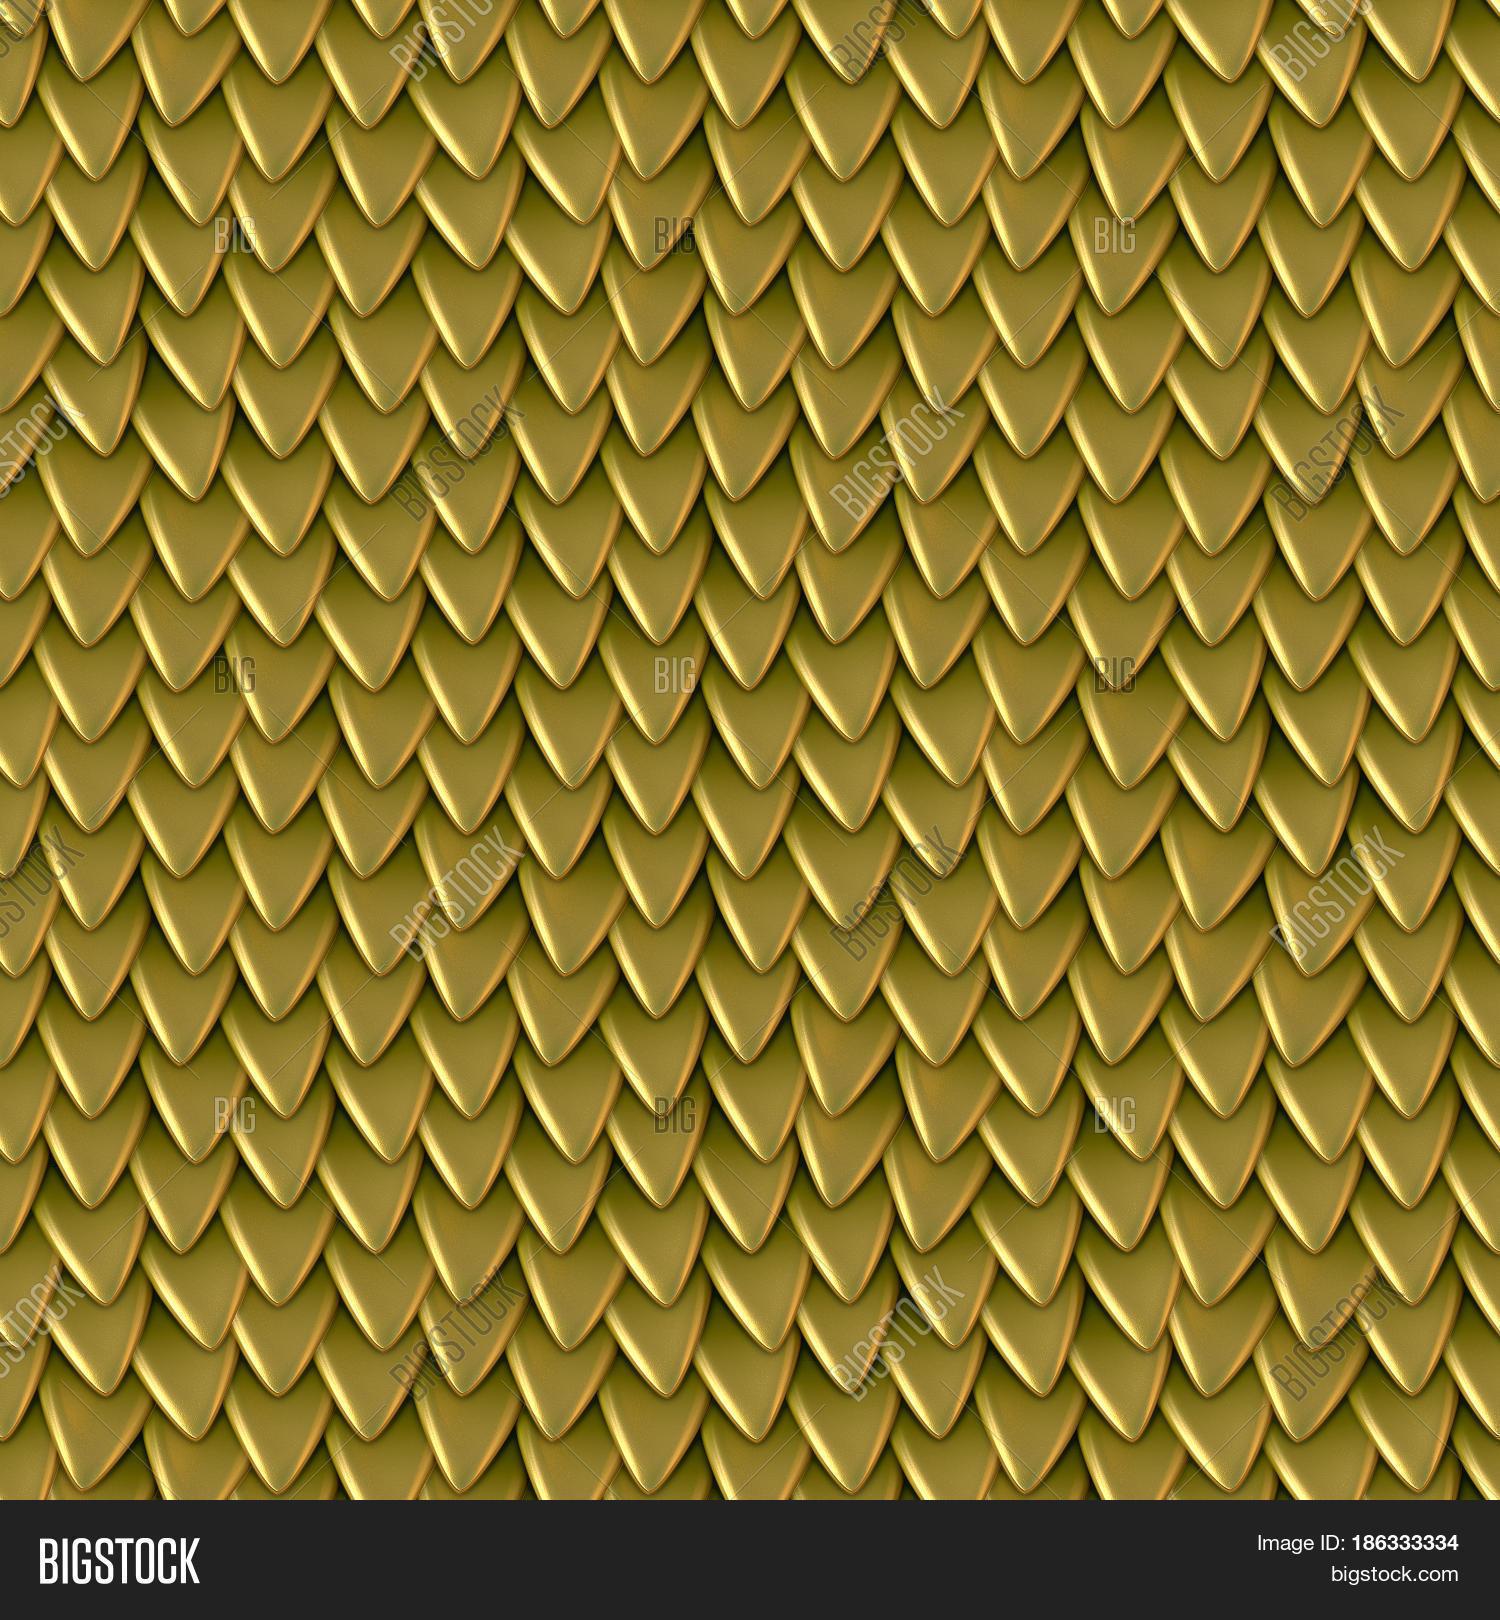 Seamless Texture Metallic Dragon Image Amp Photo Bigstock